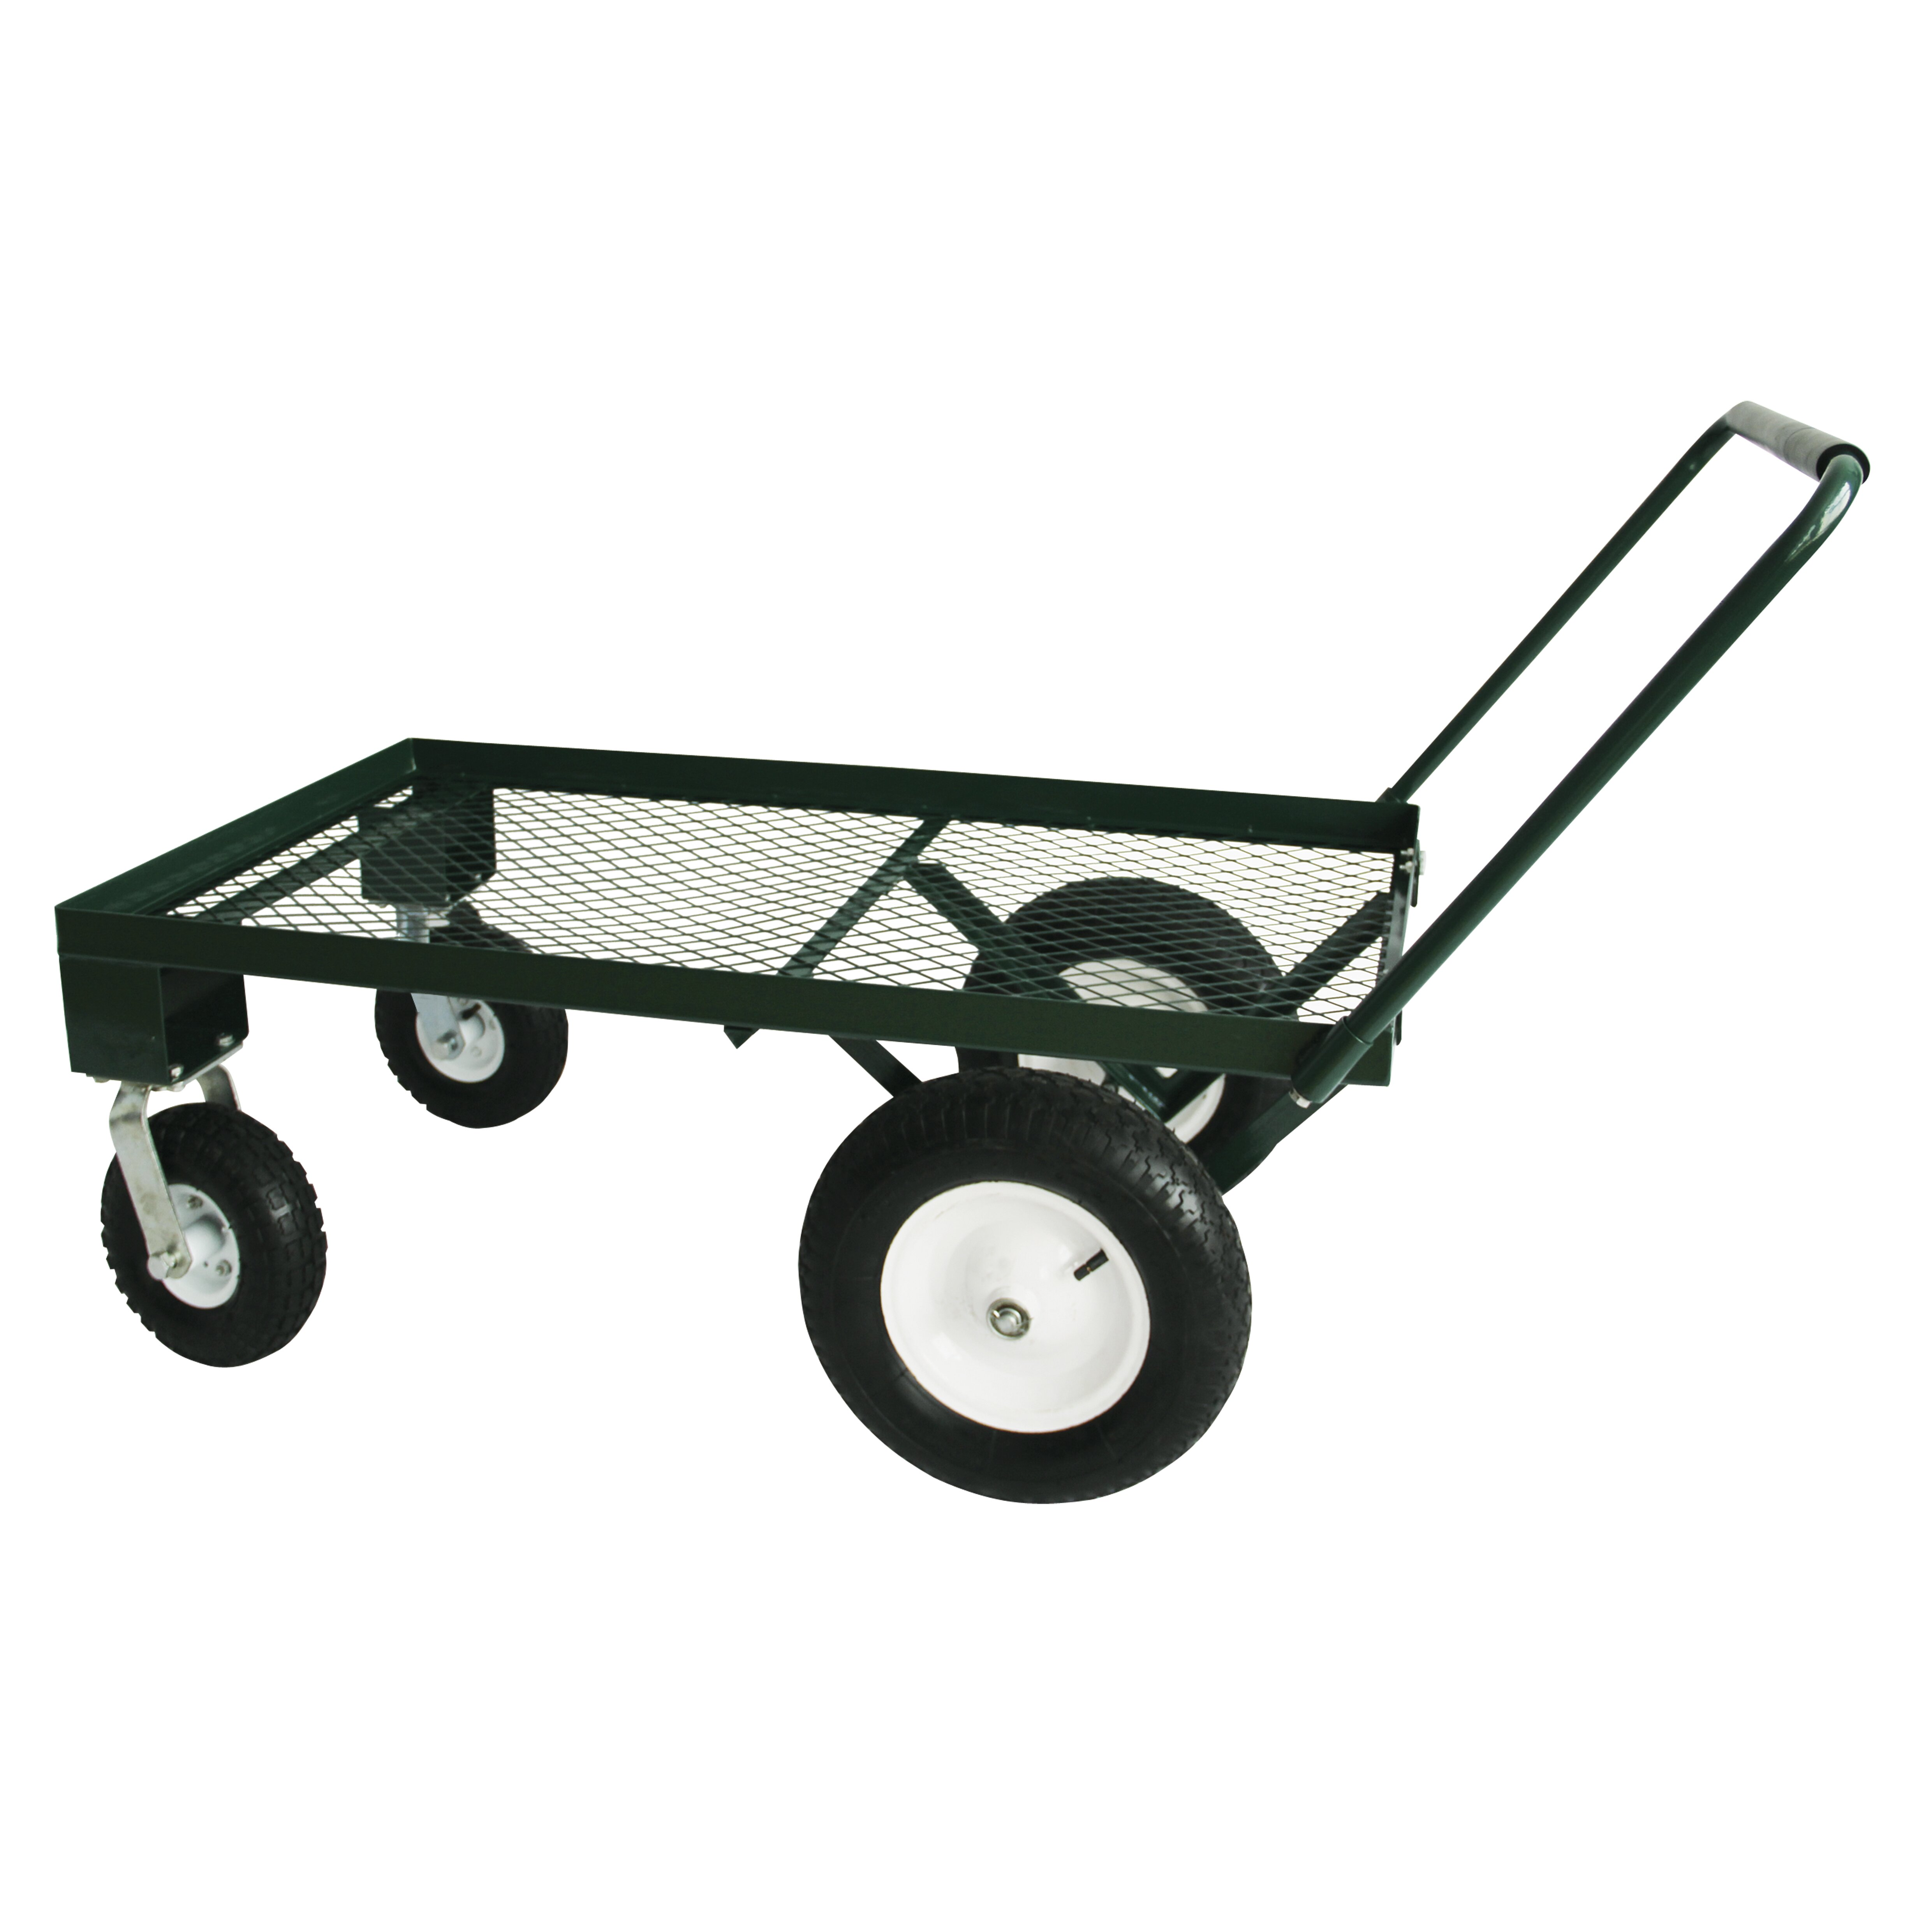 Sandusky 4 Wheel Steel Flat Wagon Amp Reviews Wayfair